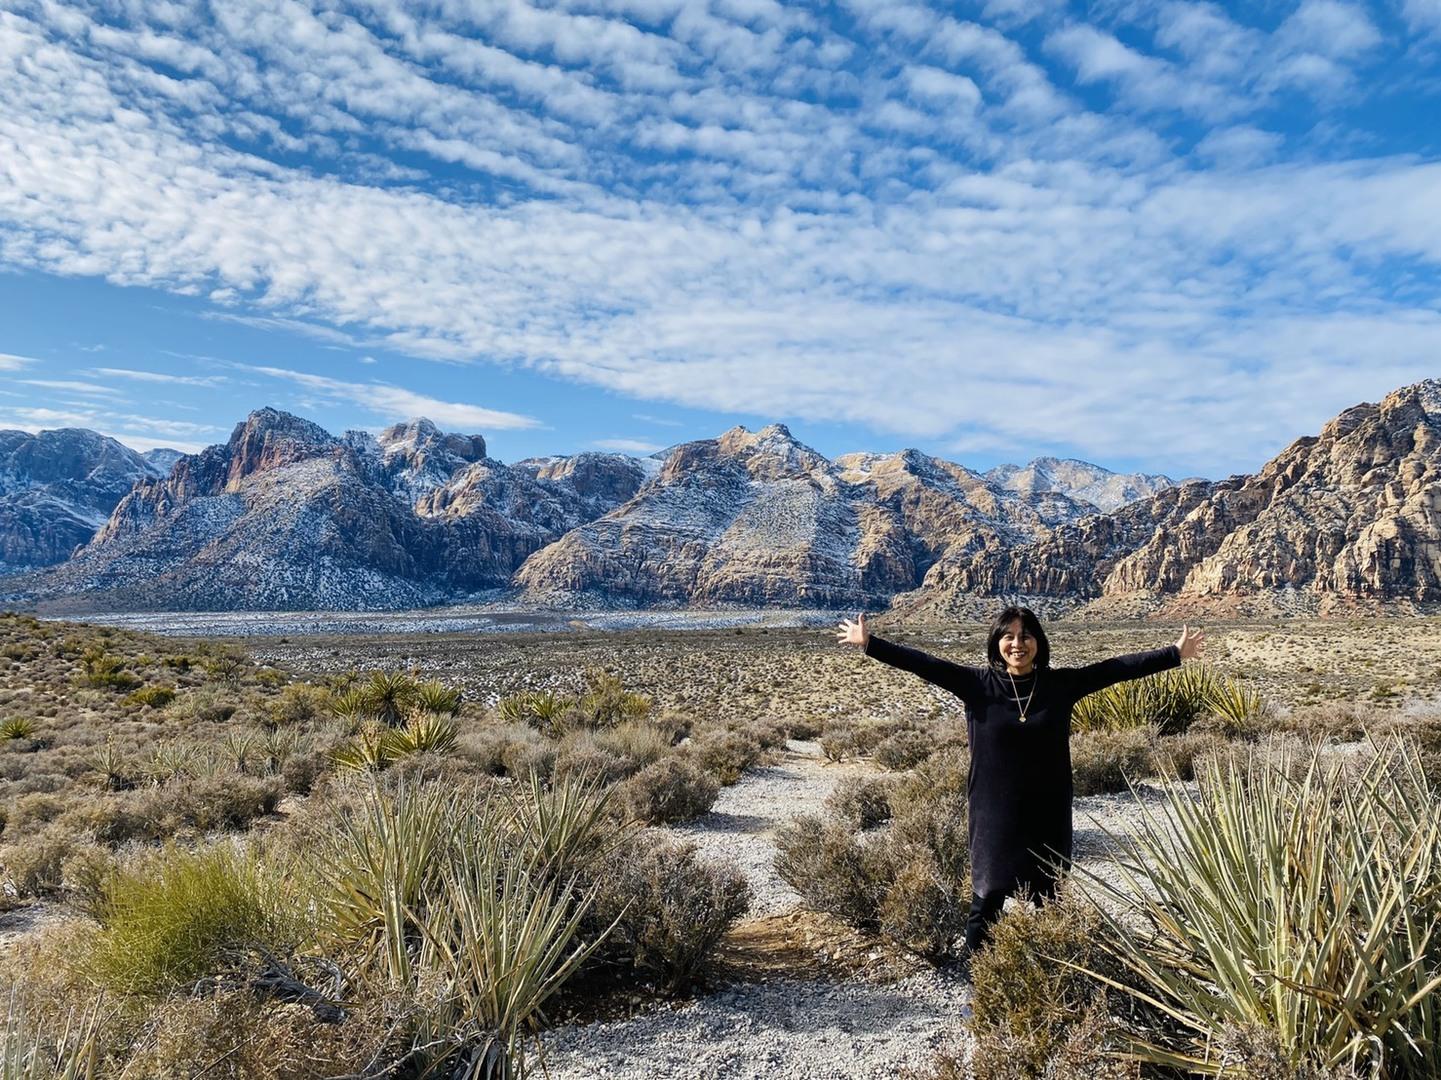 Vegasのホテルから約30分で…大自然が満喫出来て、とても良いツアーでした。 ガイドの山本さん…評判通り👍中華のグレード…もう少しアップなら⭐️5つかな⁉️